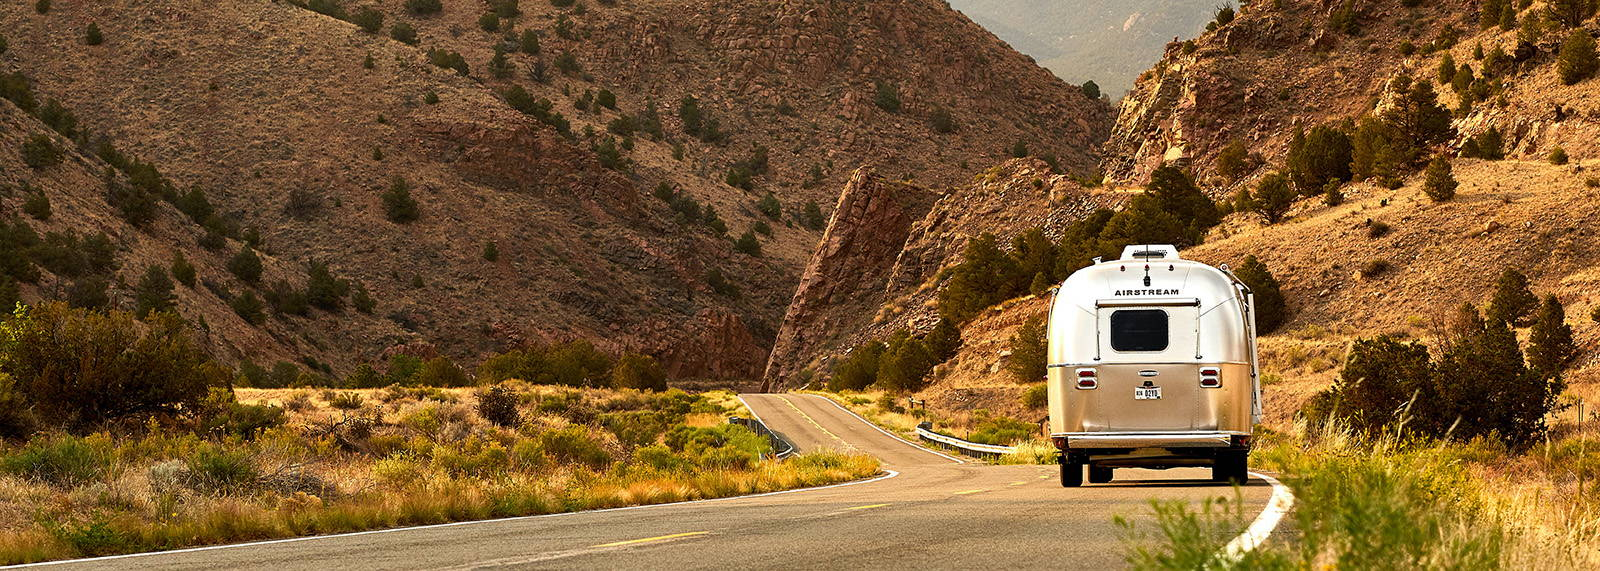 RV driving through desert